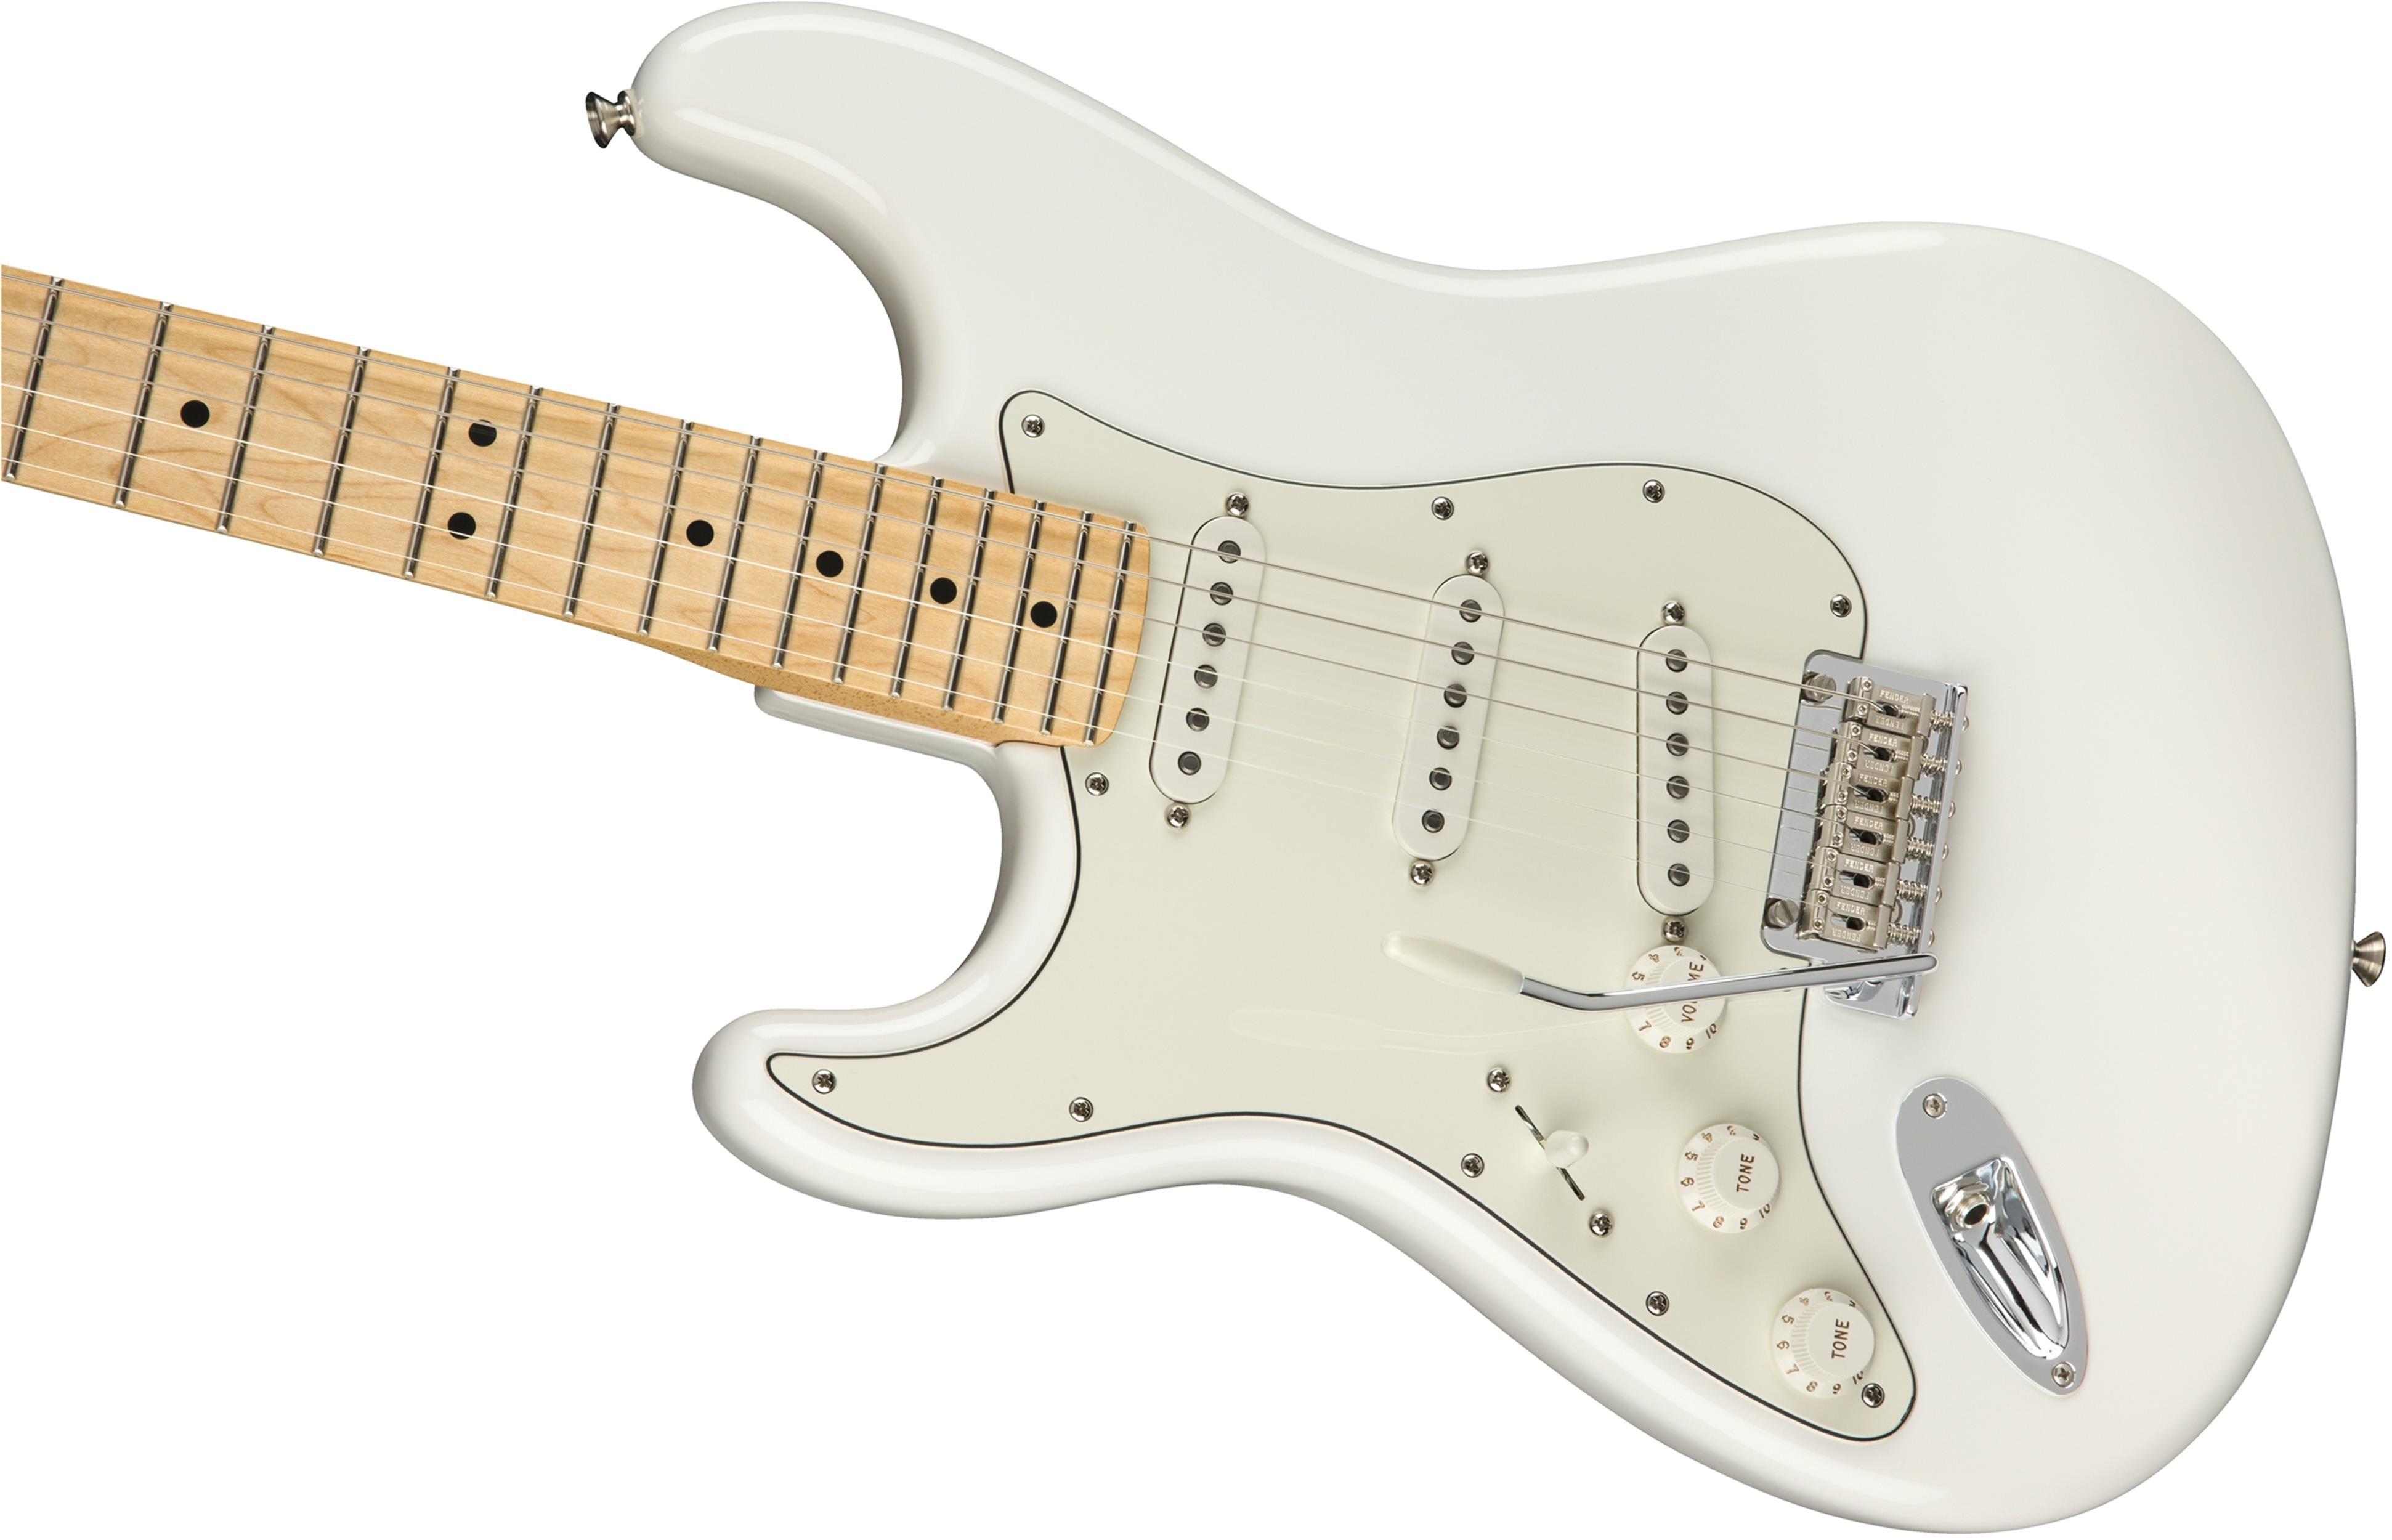 FENDER-Player-Stratocaster-Left-Handed-LH-MANCINA-MN-Polar-White-0144512515-sku-20656